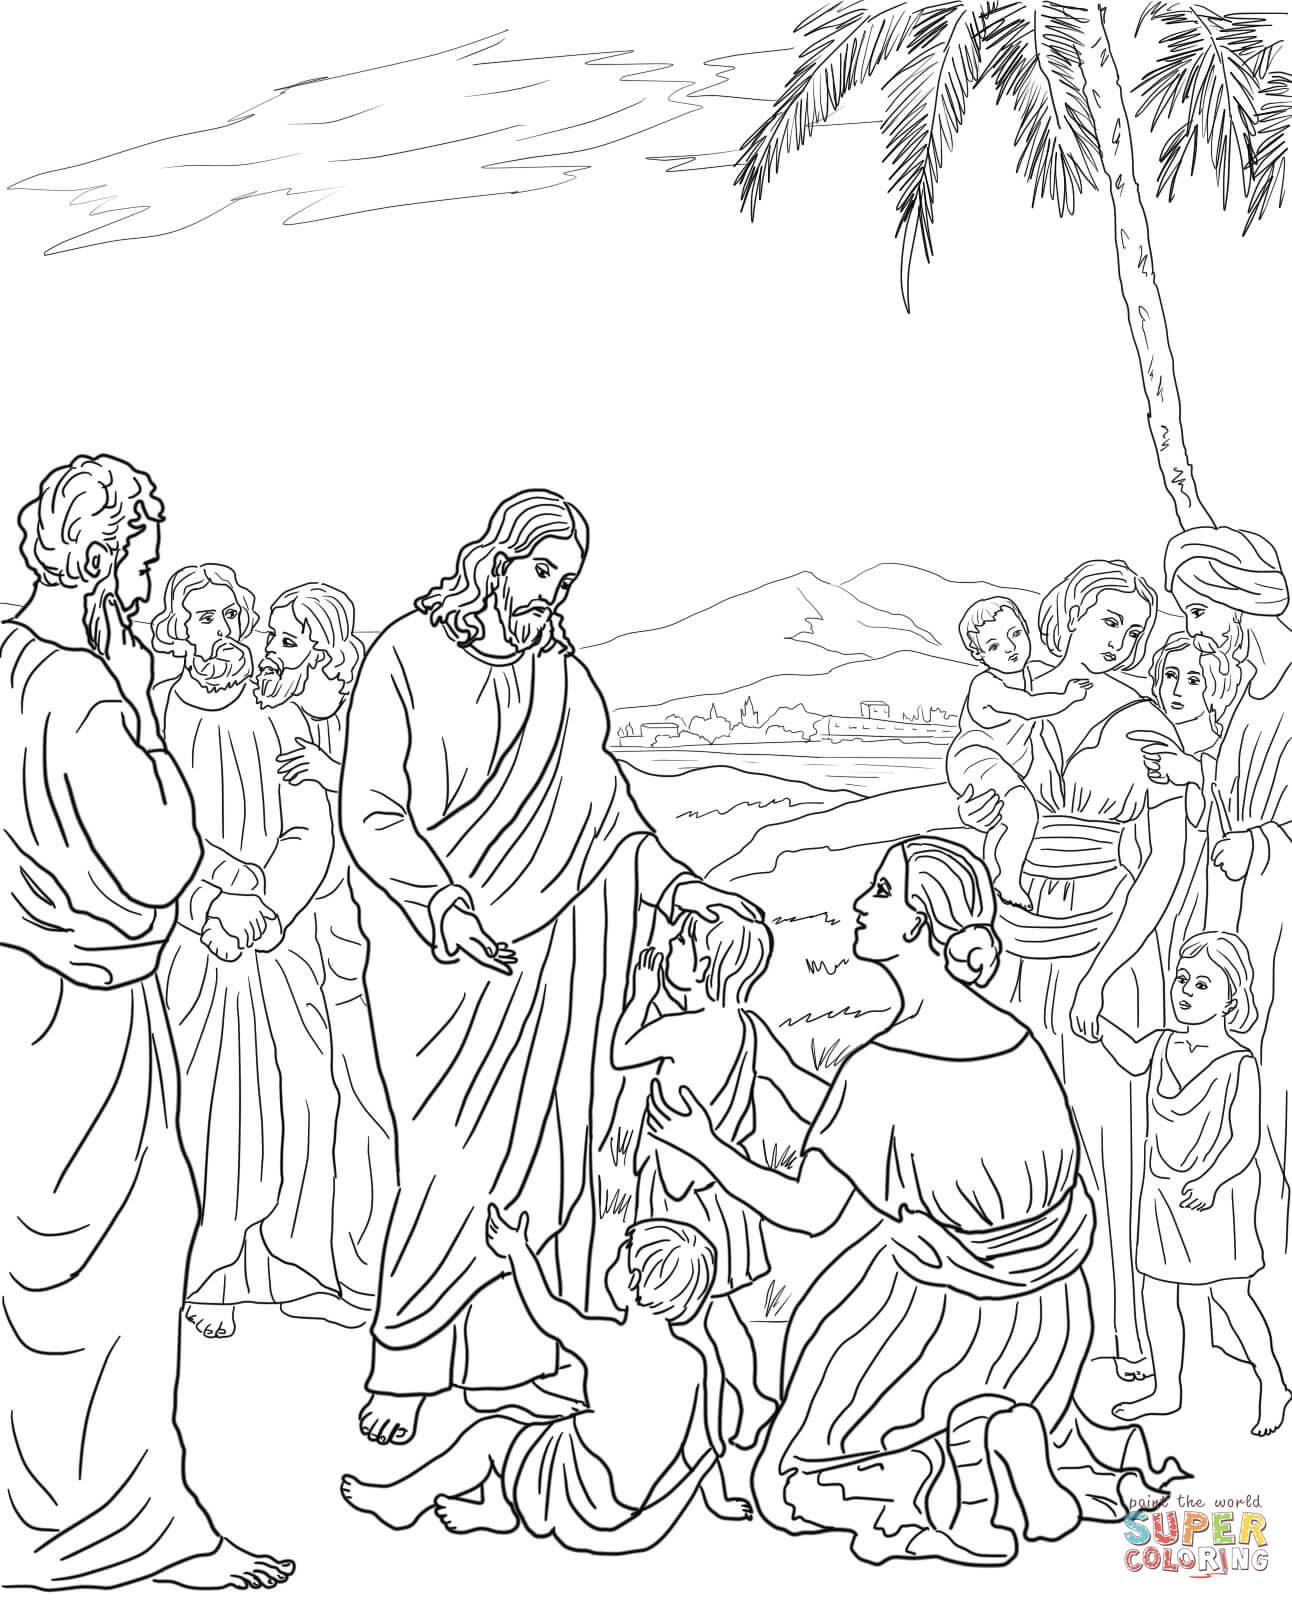 Jeesus siunaa lapset super coloring uskonto pinterest